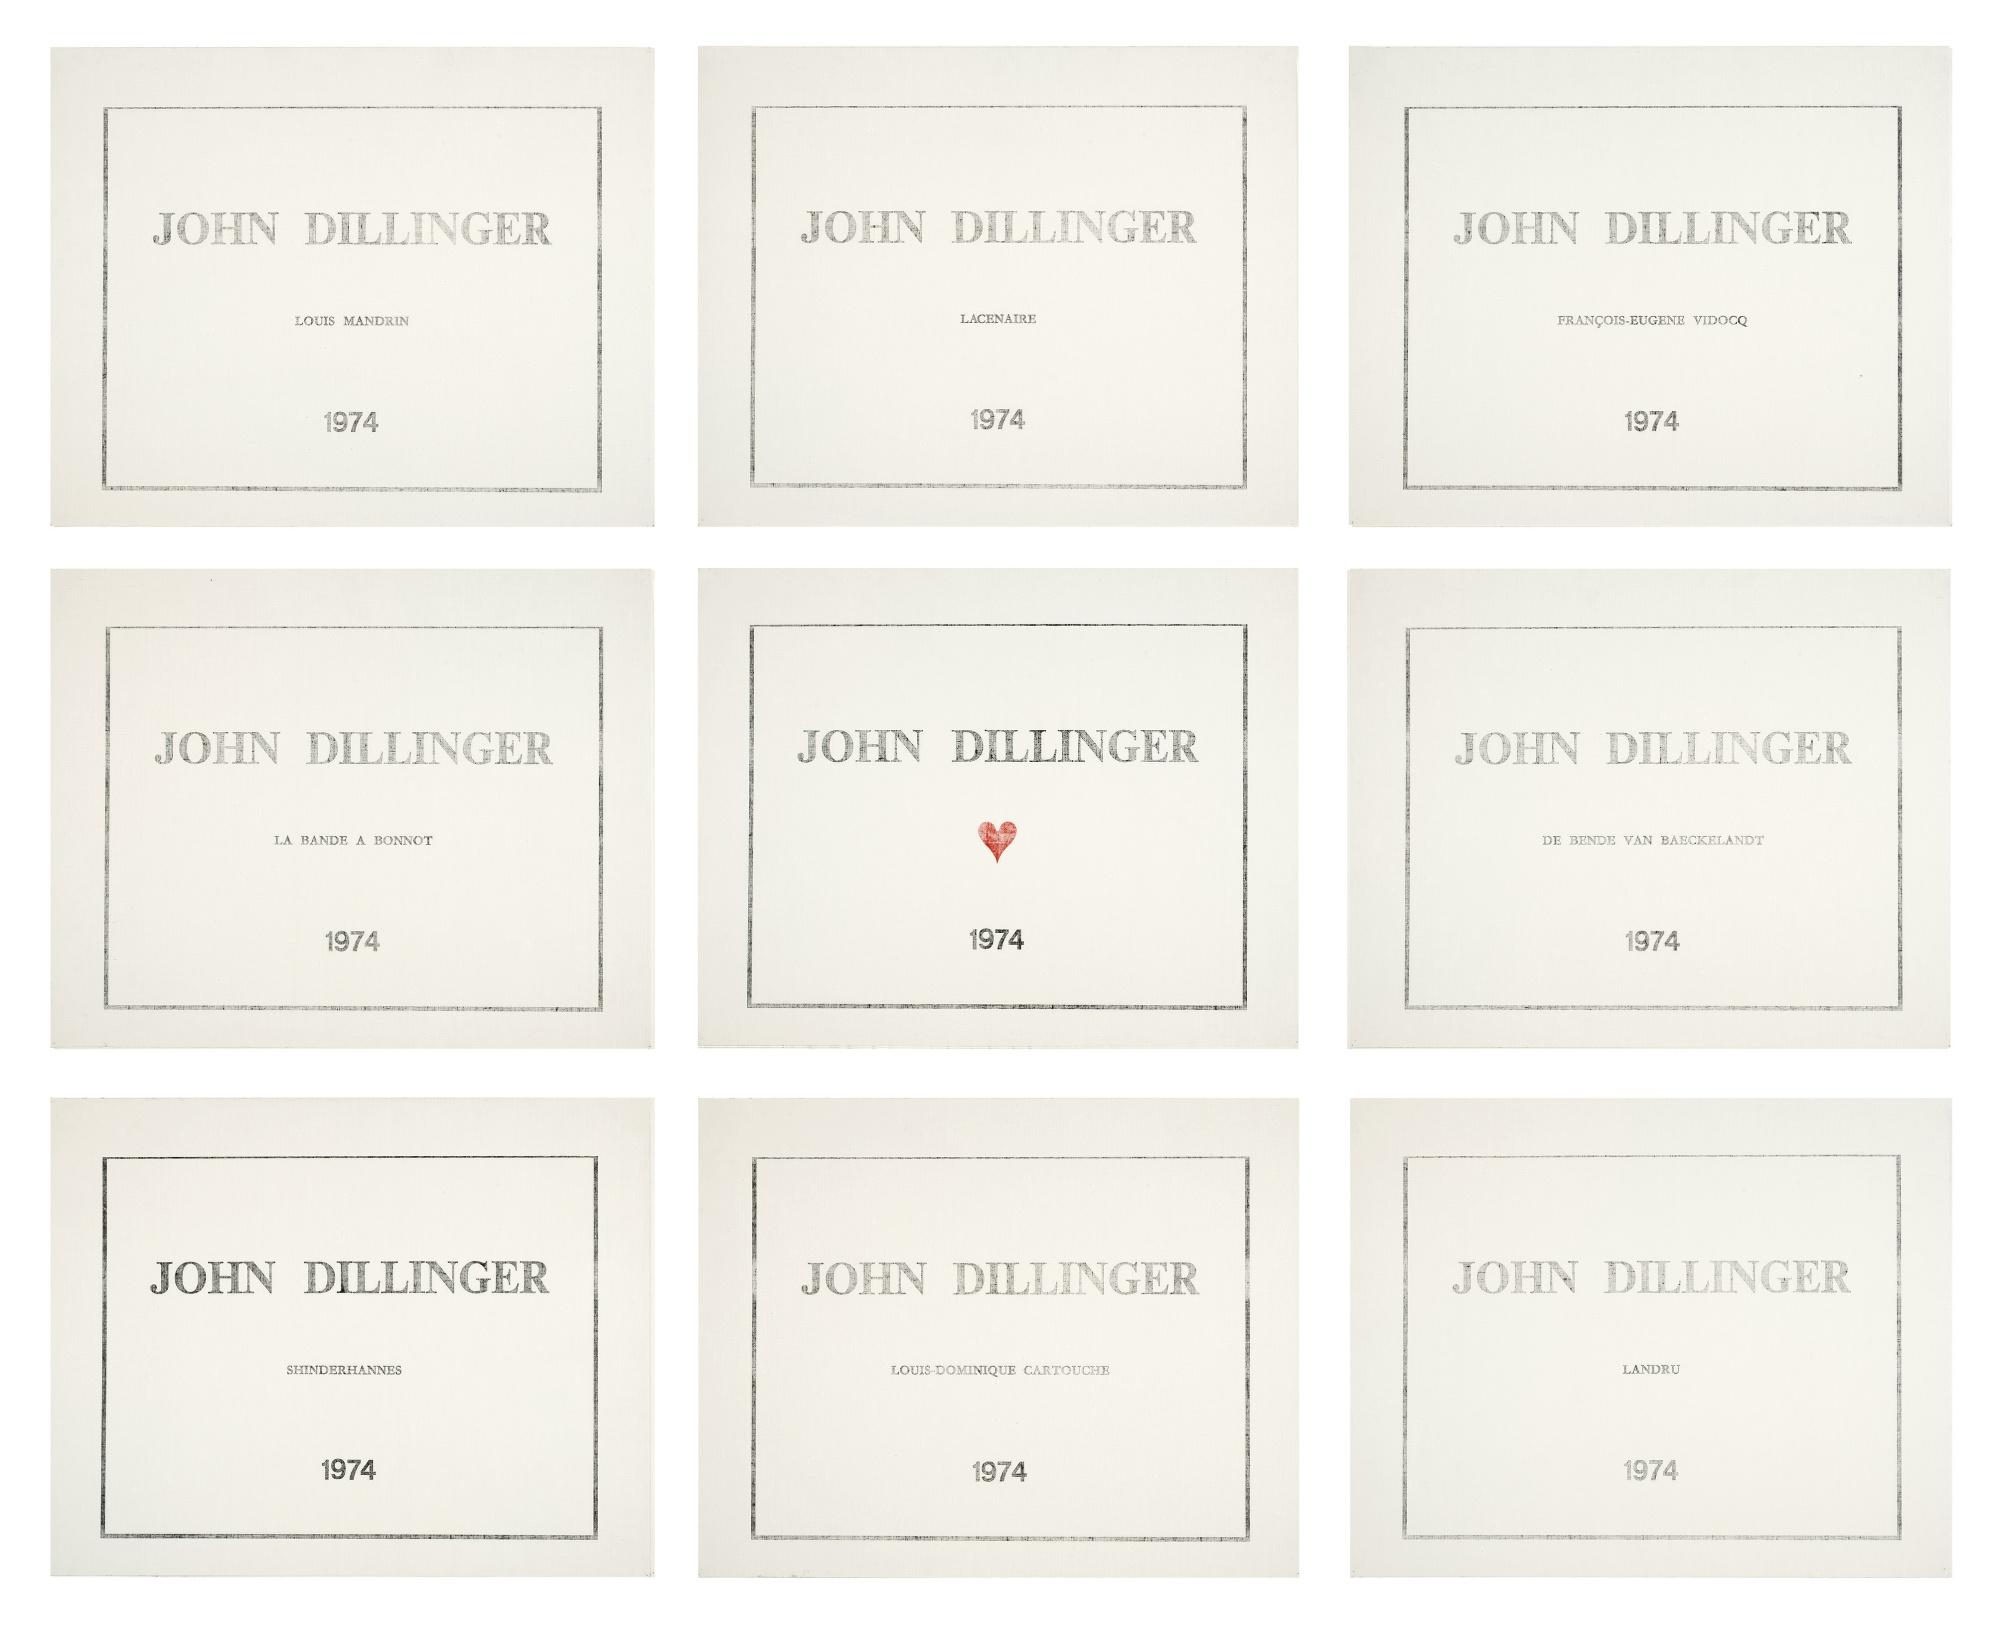 Marcel Broodthaers-Culture Internationale John Dillinger-1974